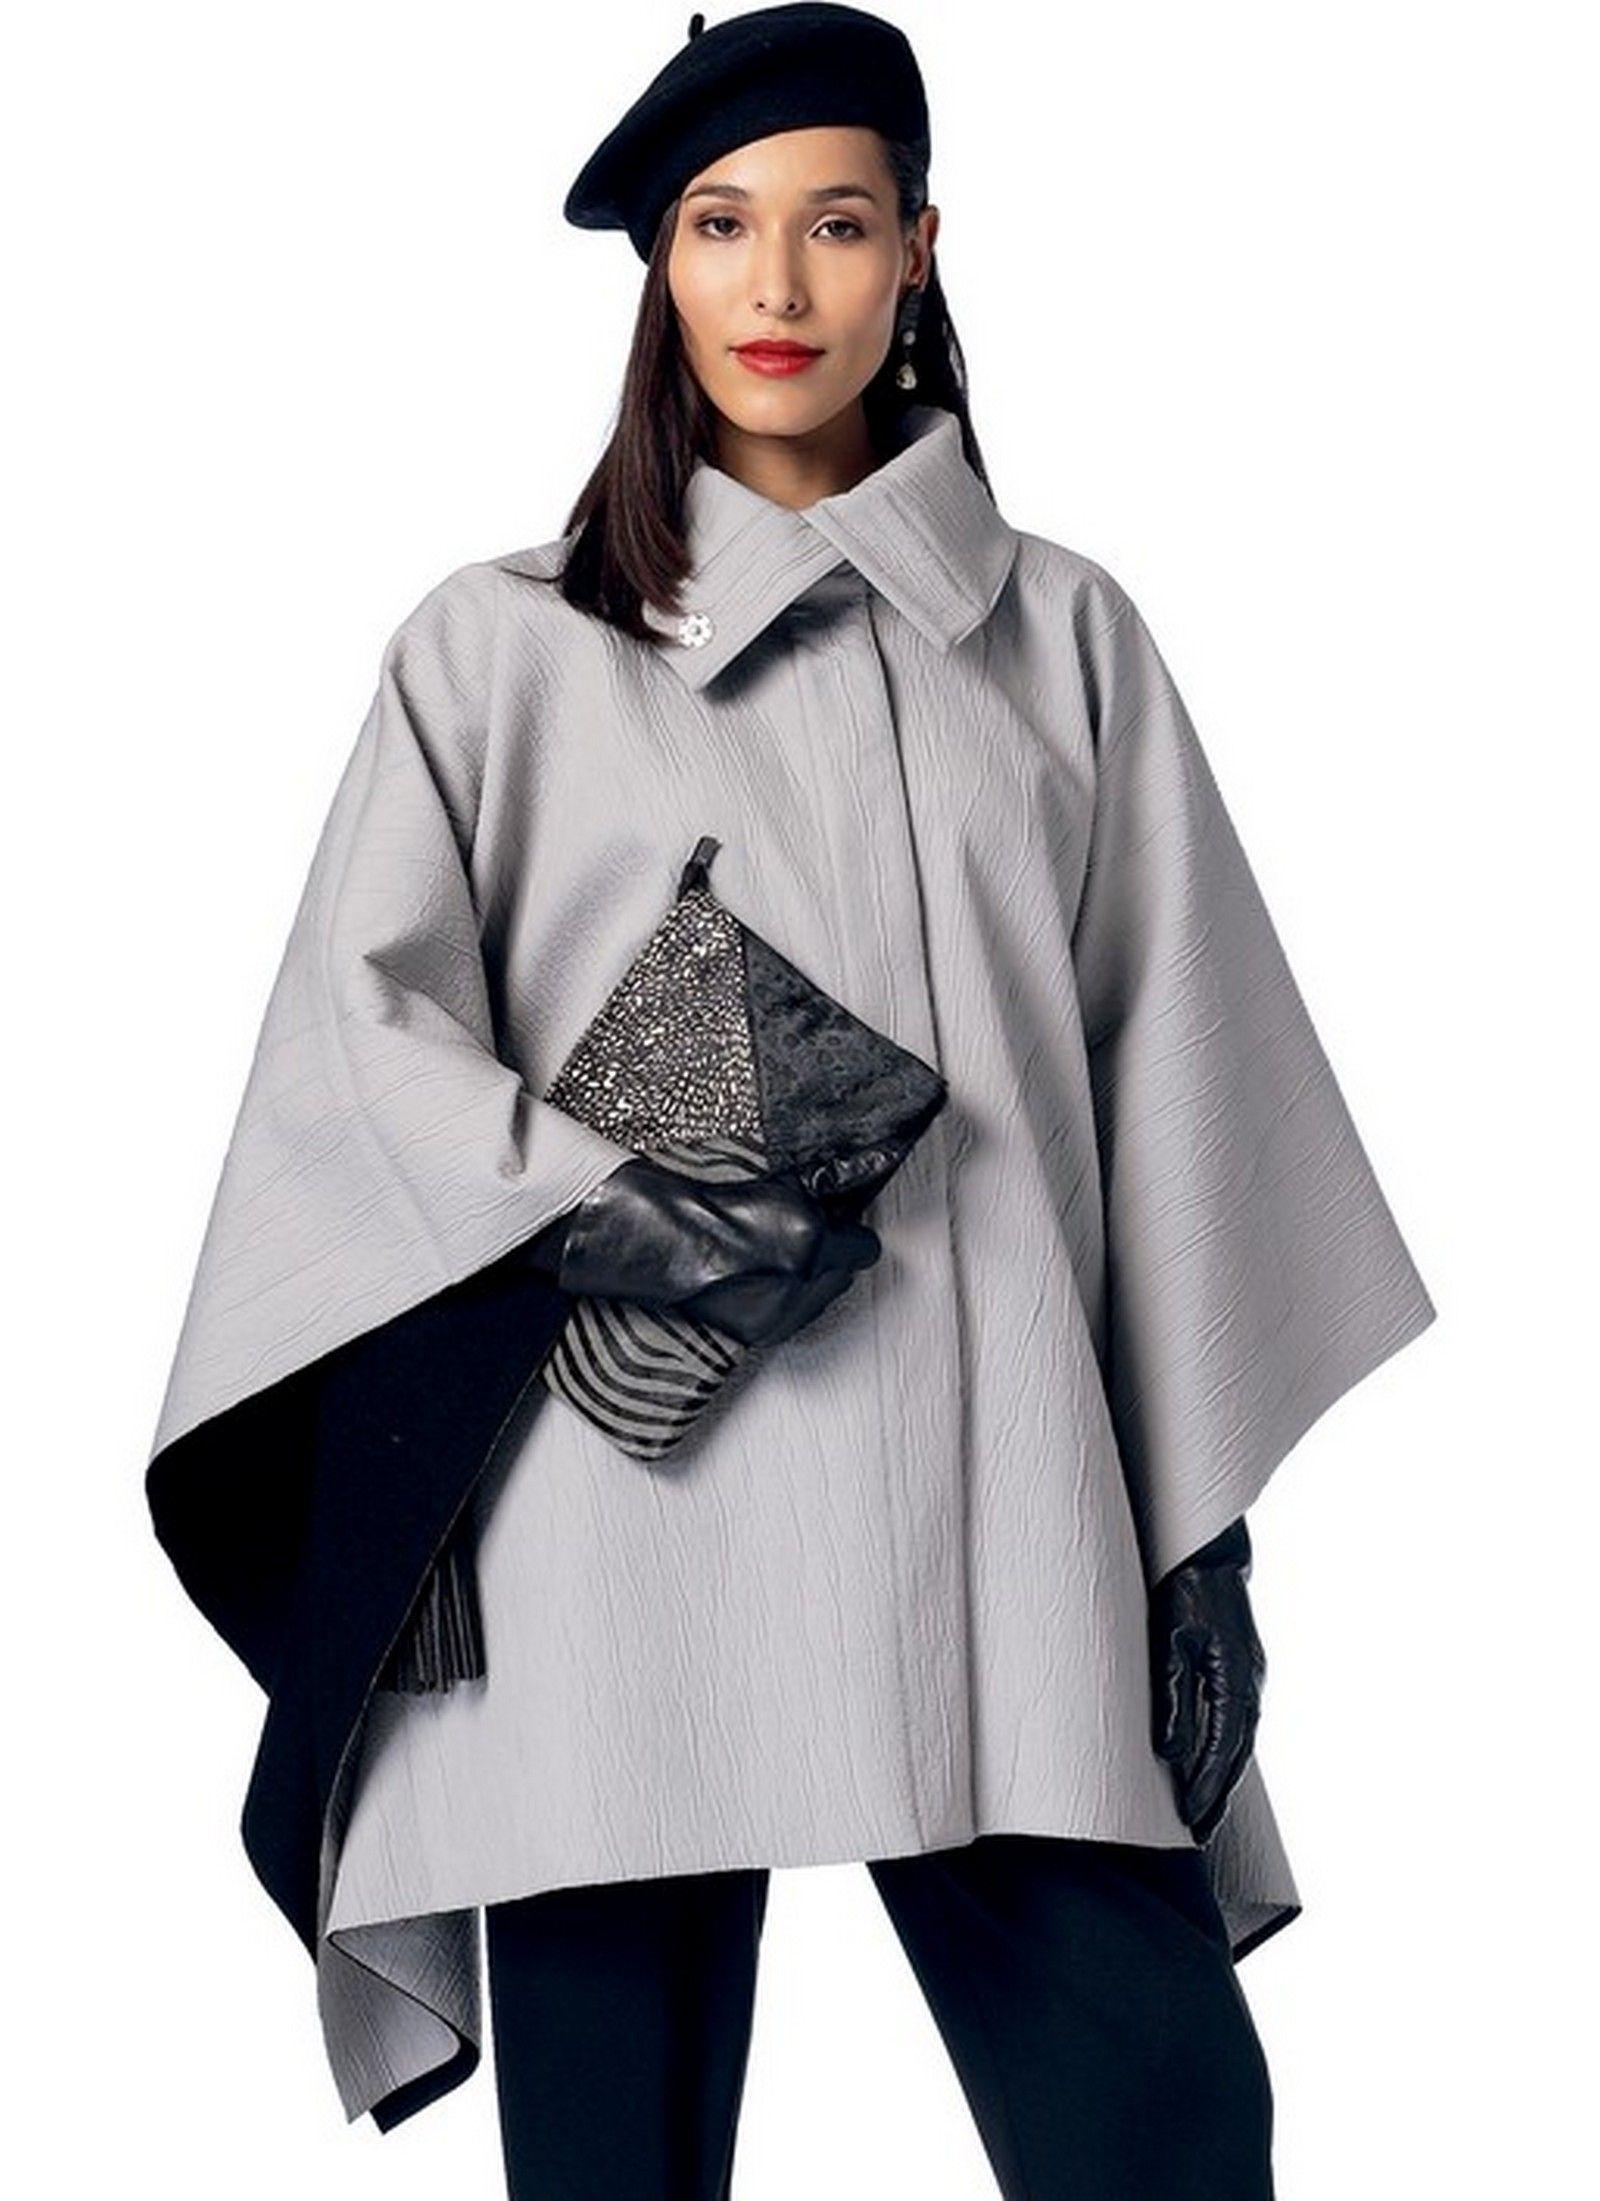 Vogue 9211 | Sewing | Pinterest | Dressmaking and Patterns